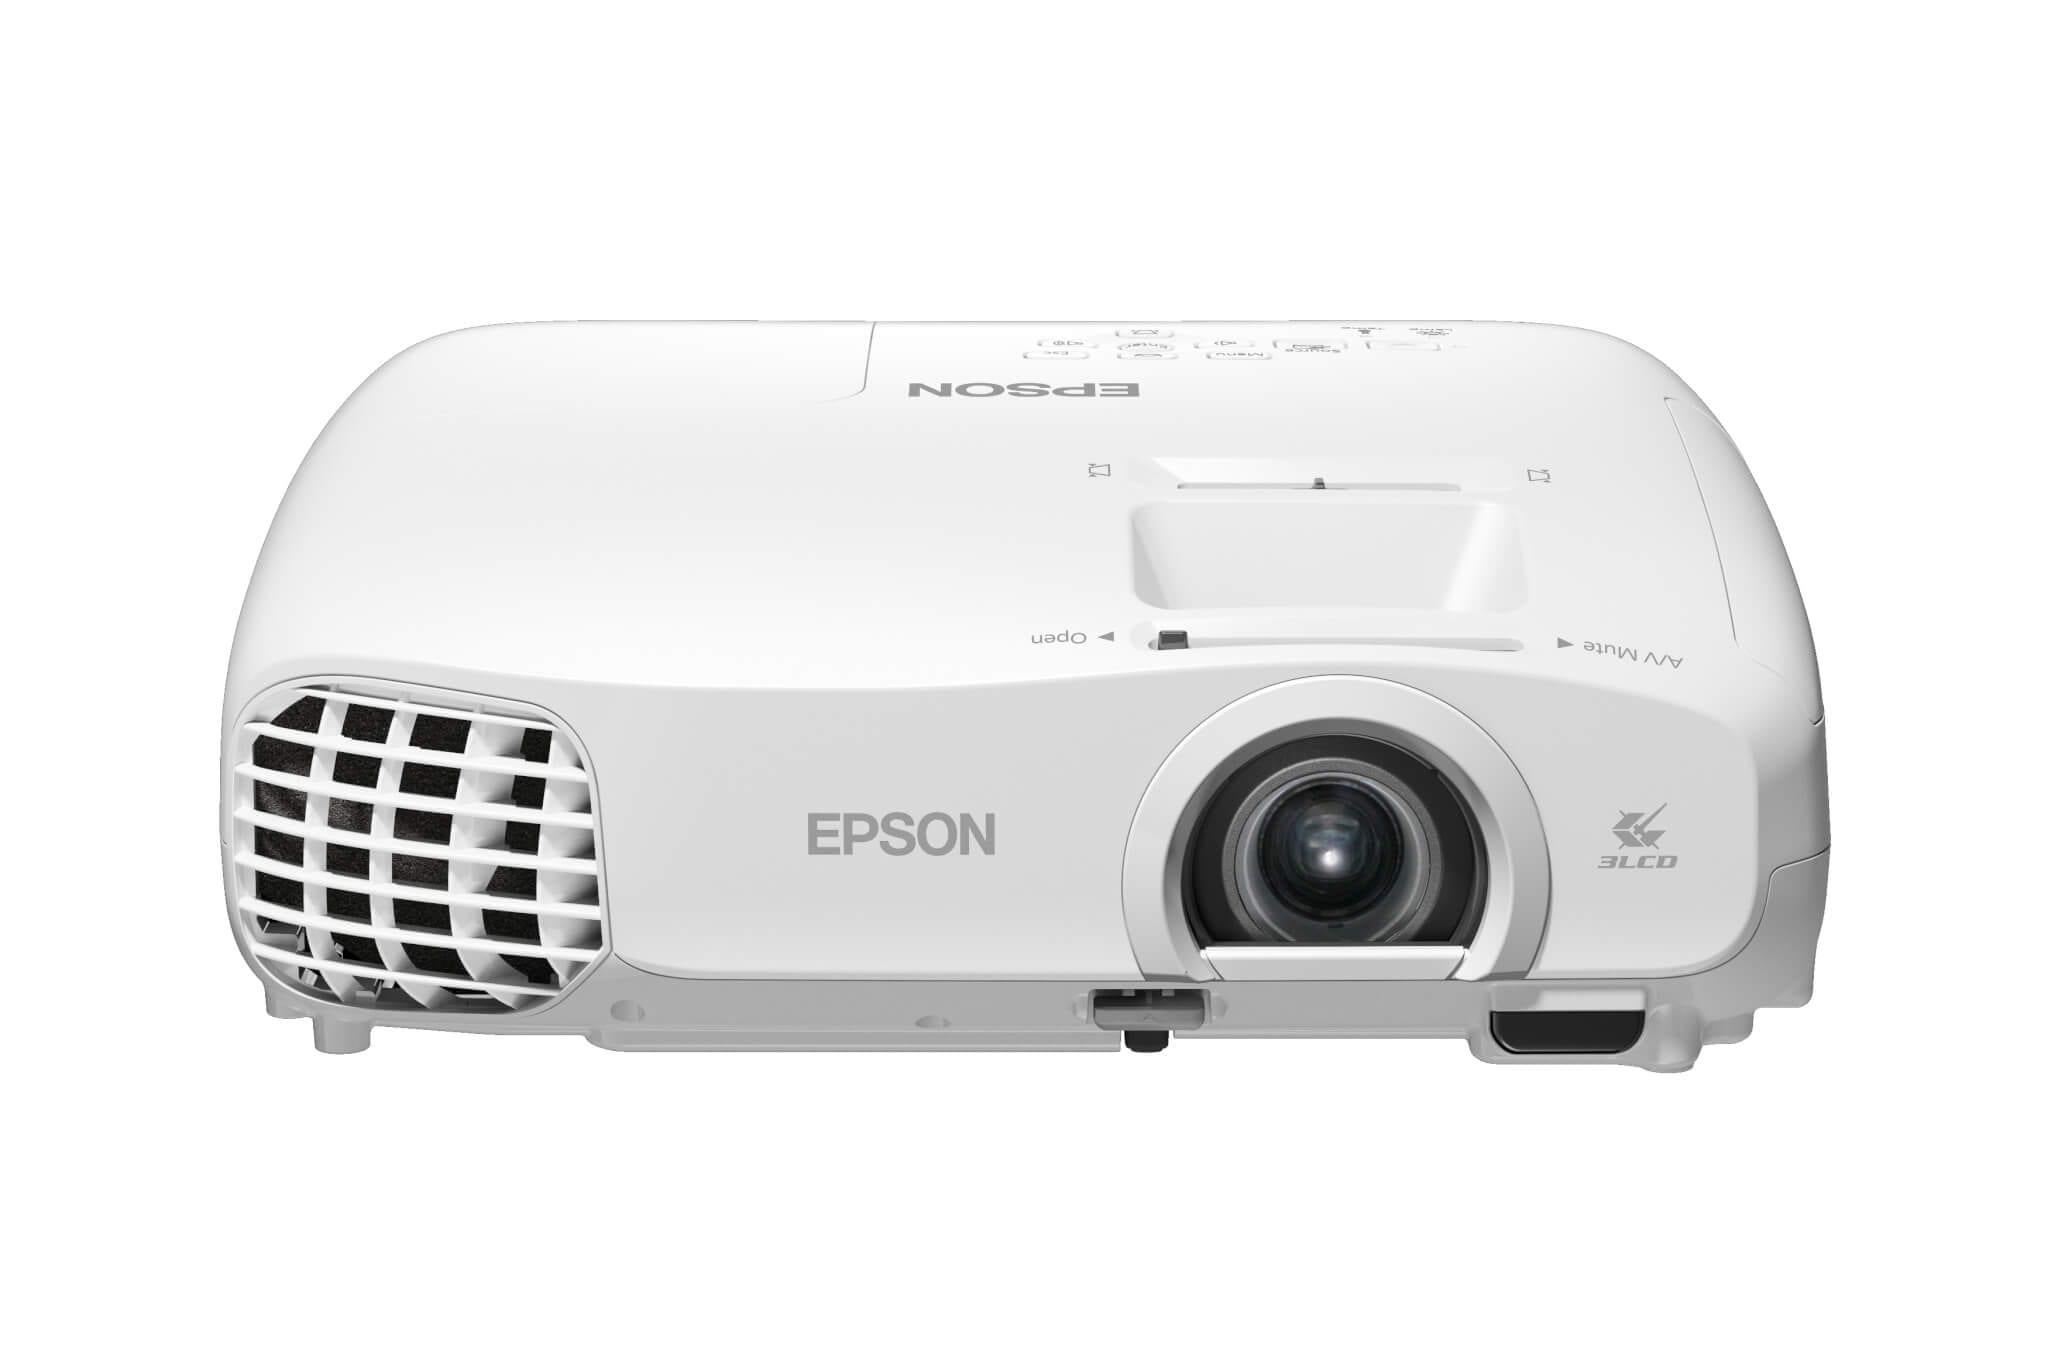 Projektor Epson 5100